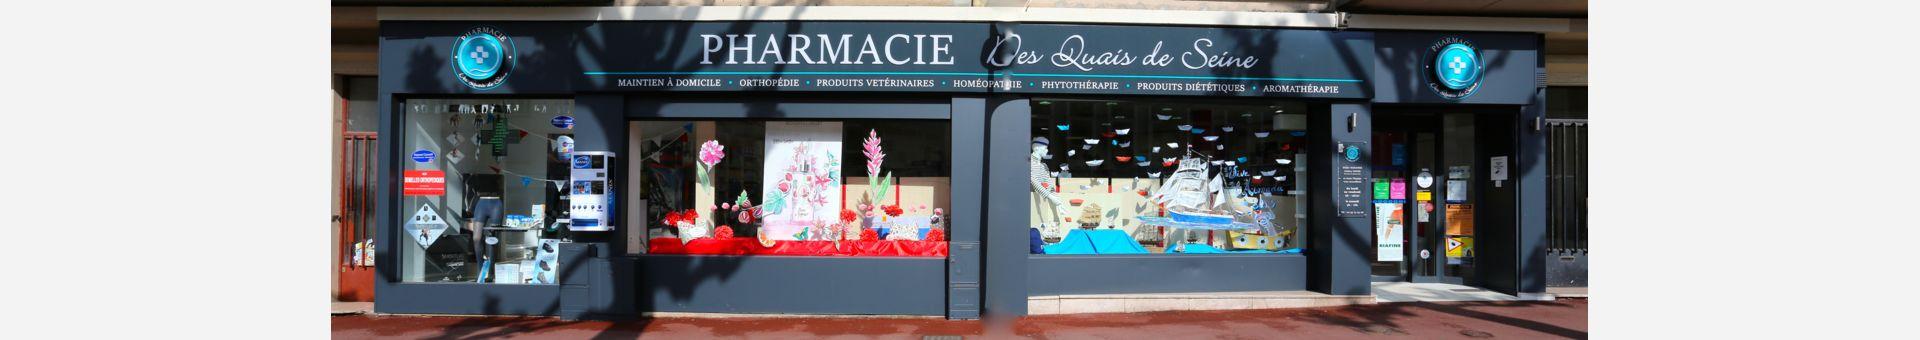 Pharmacie des Quais de Seine,ROUEN